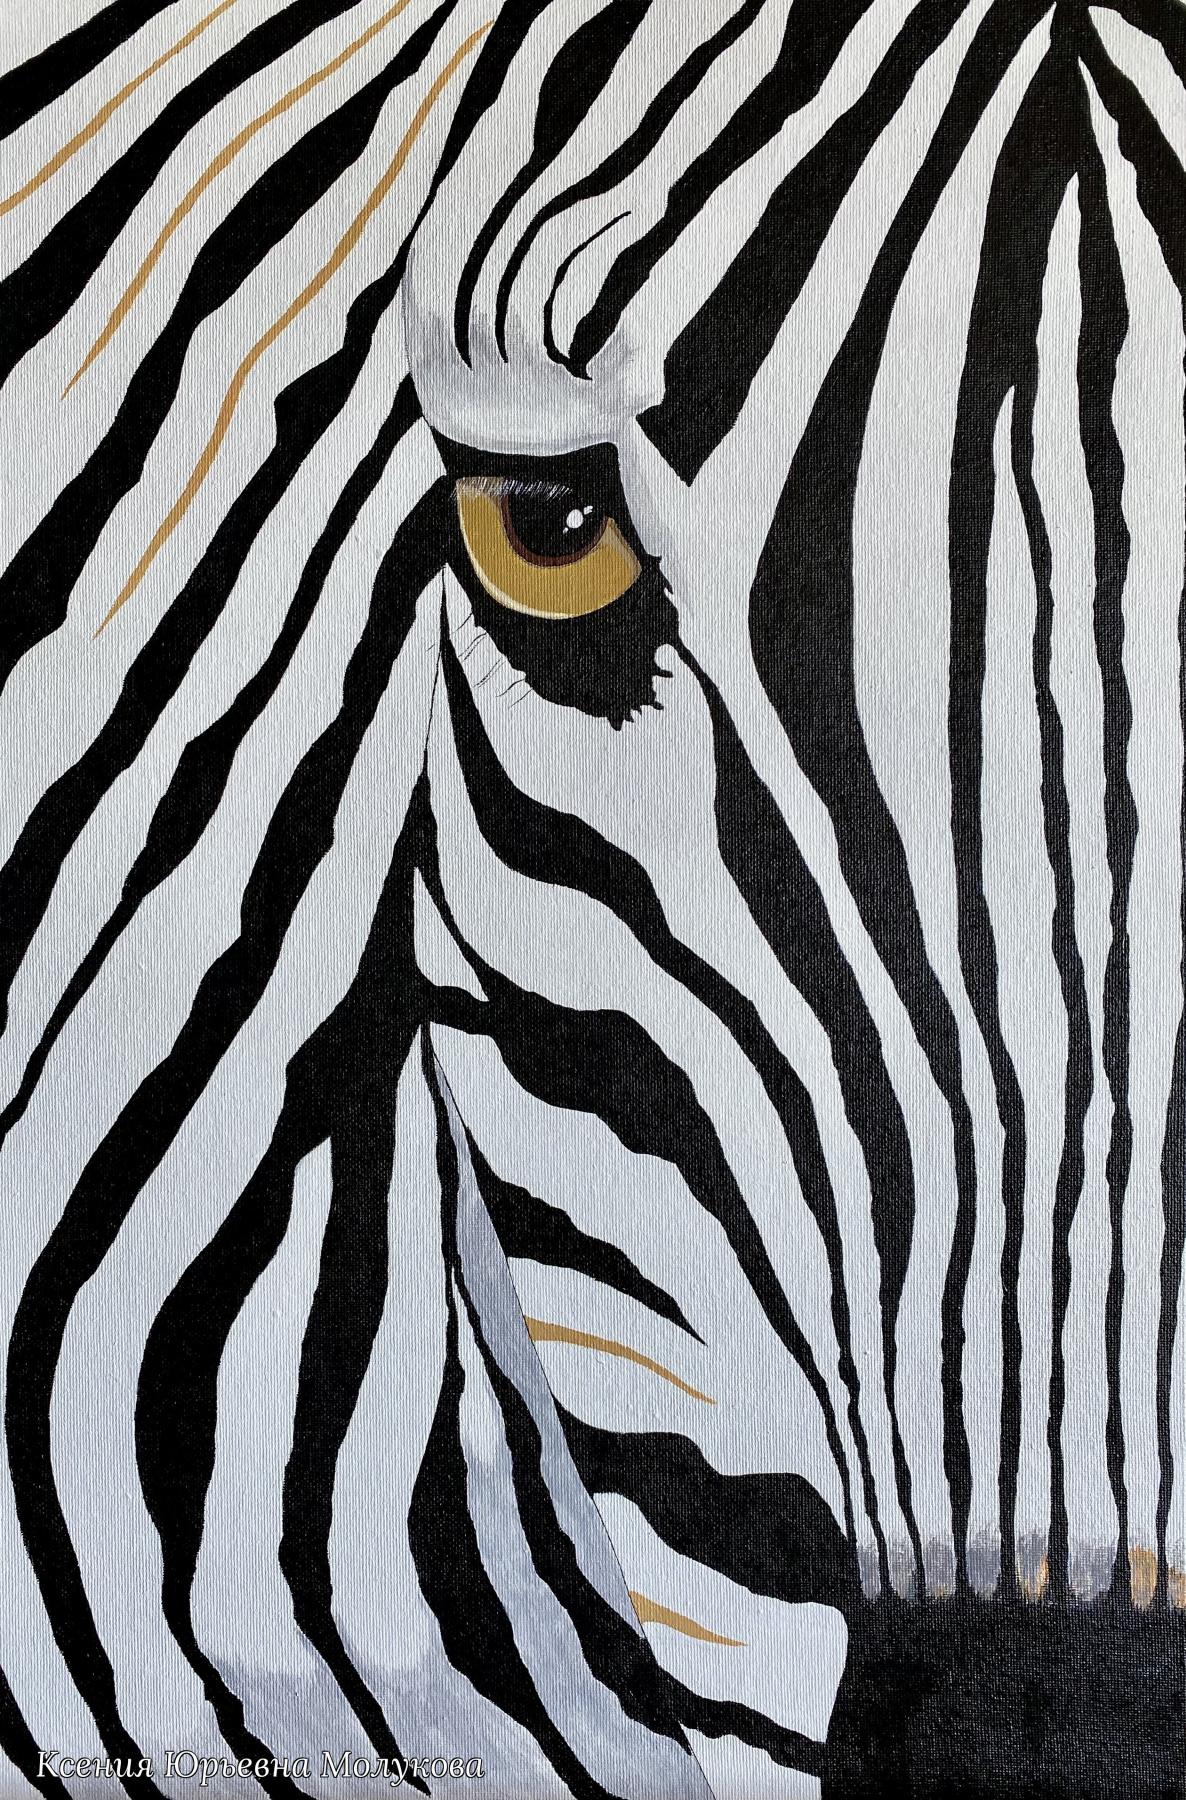 Ksenia Yurievna Molukova. Zebra